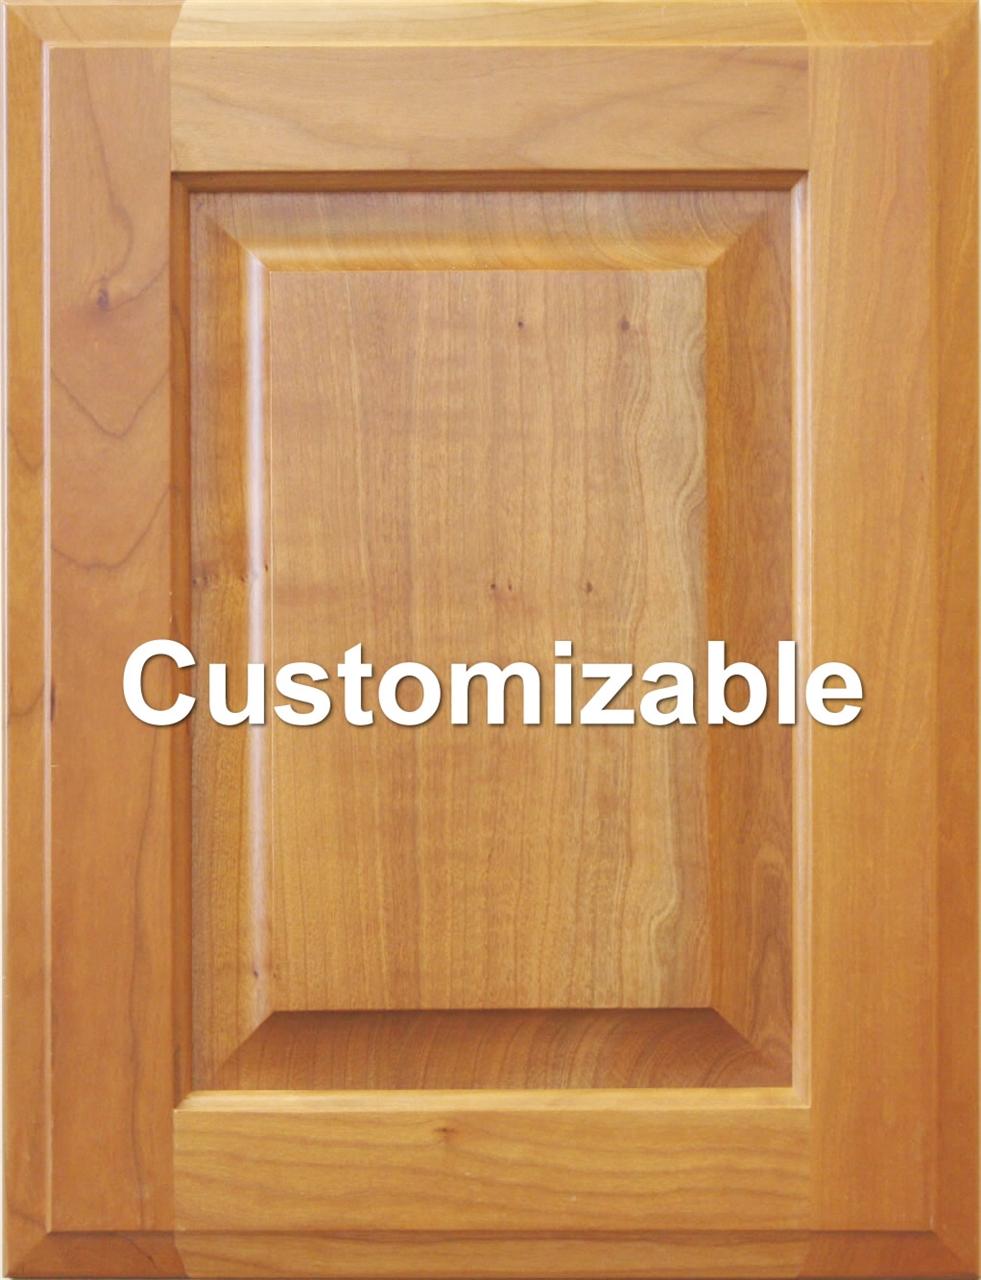 Custom Raised Panel Cabinet Door